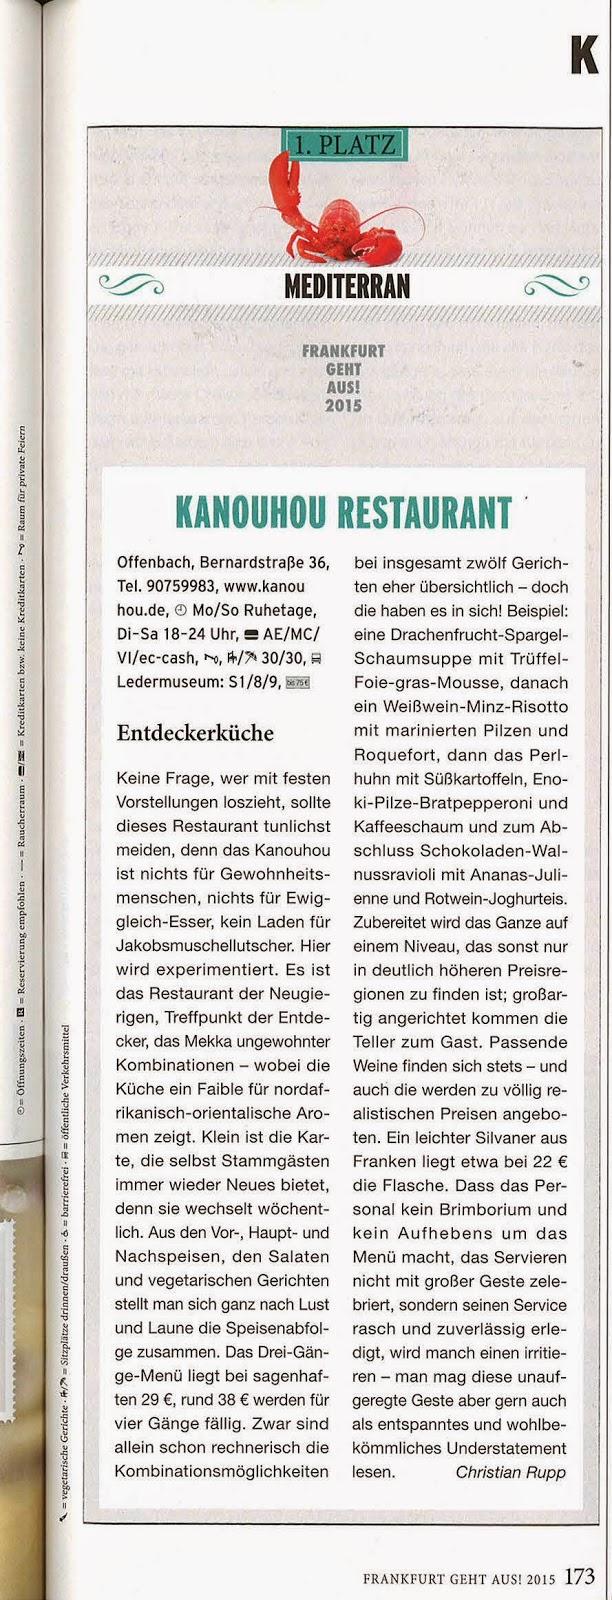 http://etage3.com/kunden/KAN/FrankfurtGehtAus_2015_Kanouhou.pdf